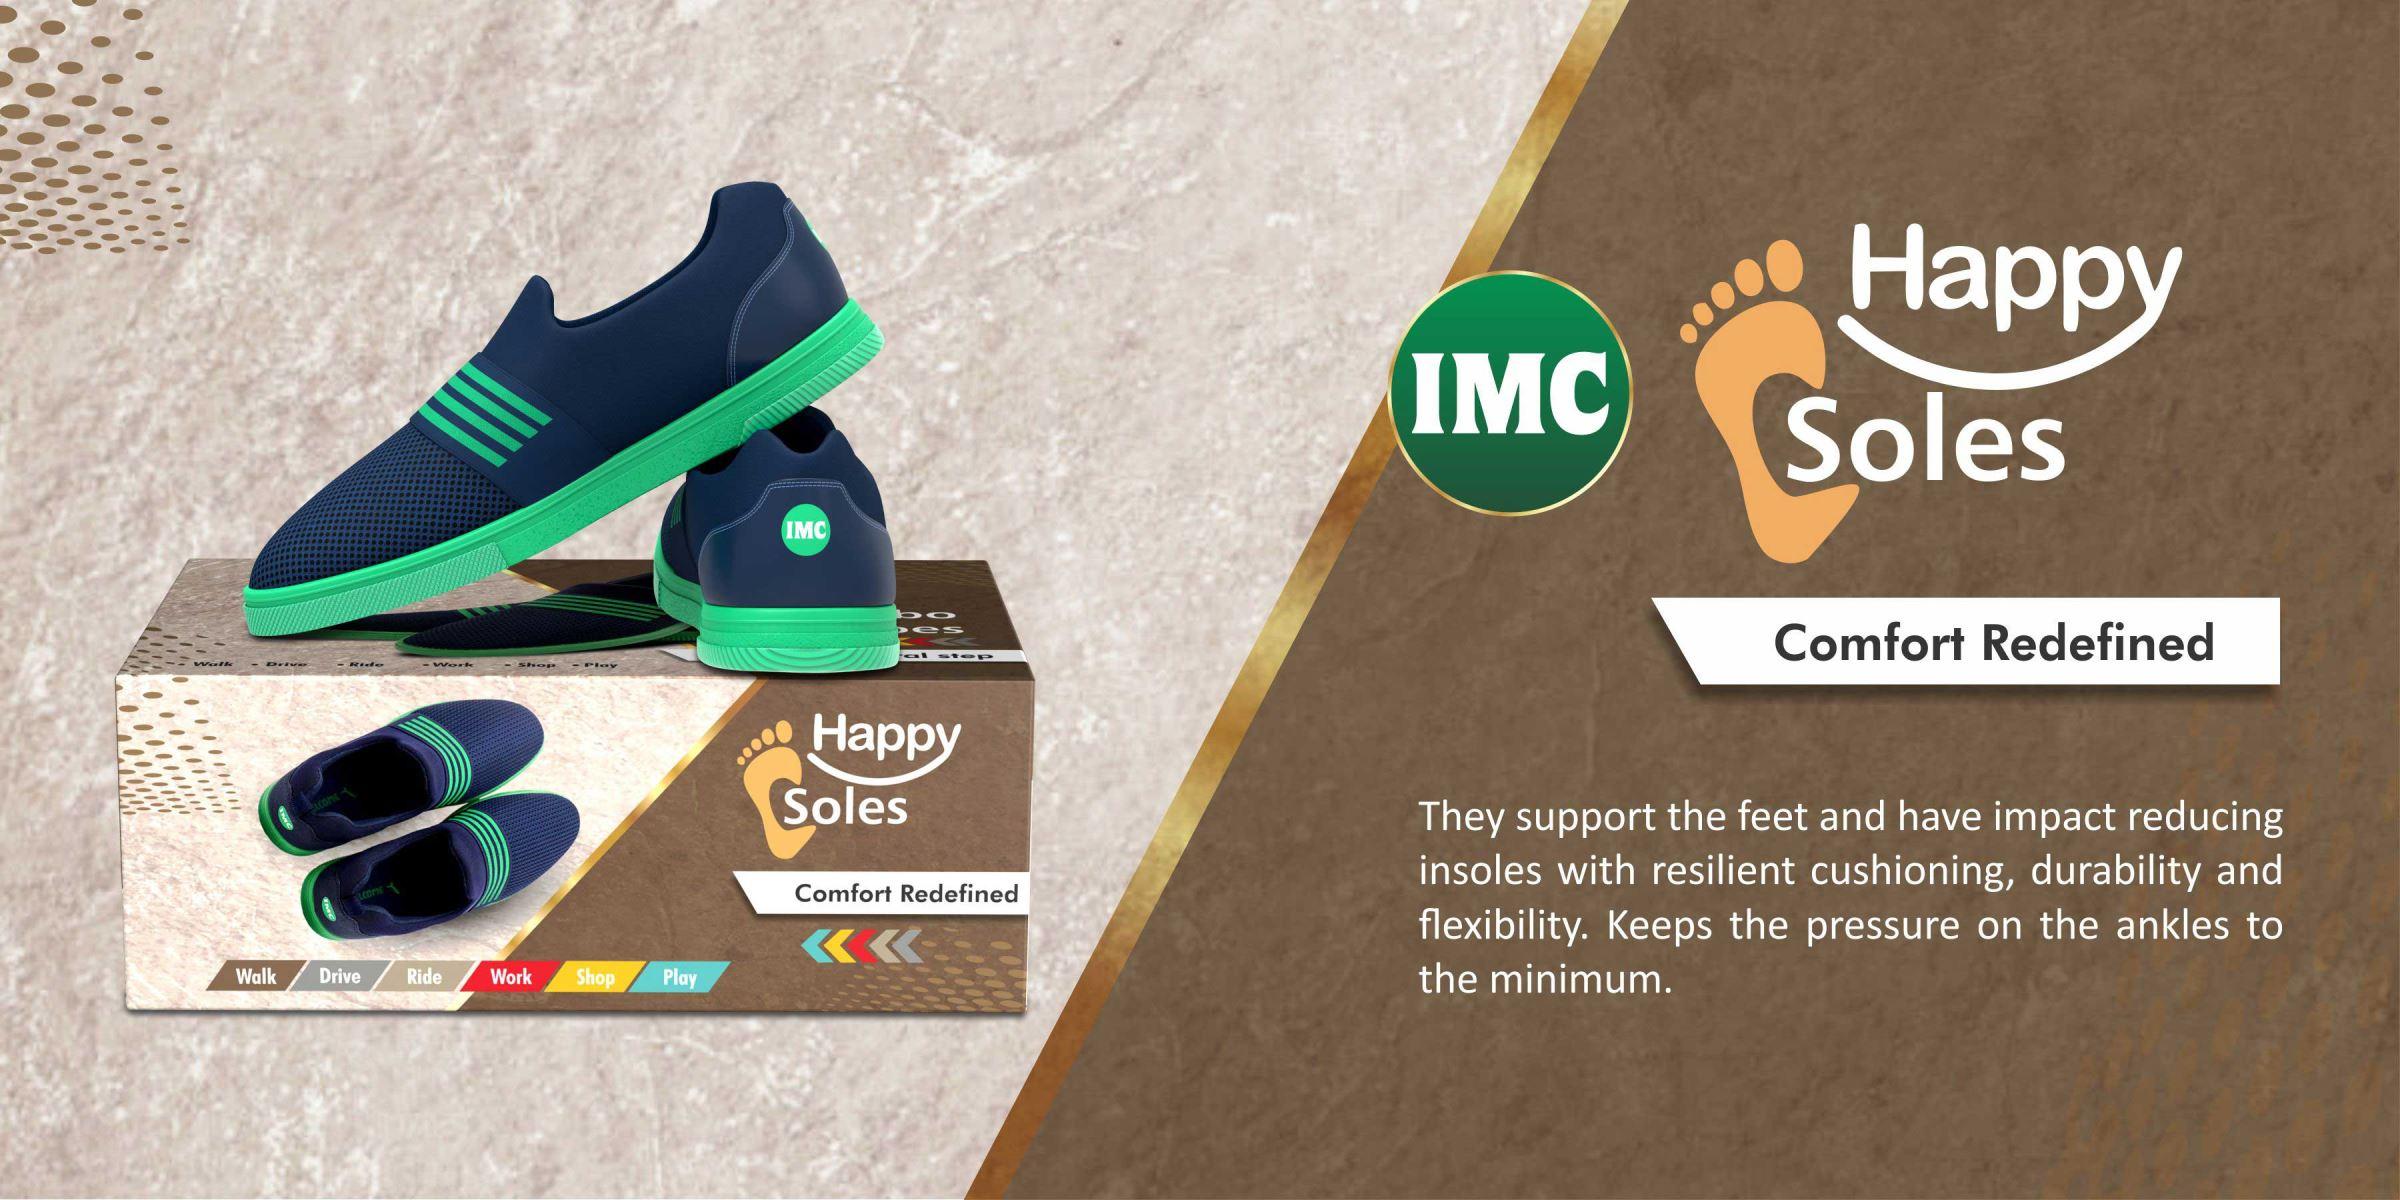 IMC HAPPY SOLES SHOES | | Buy imc